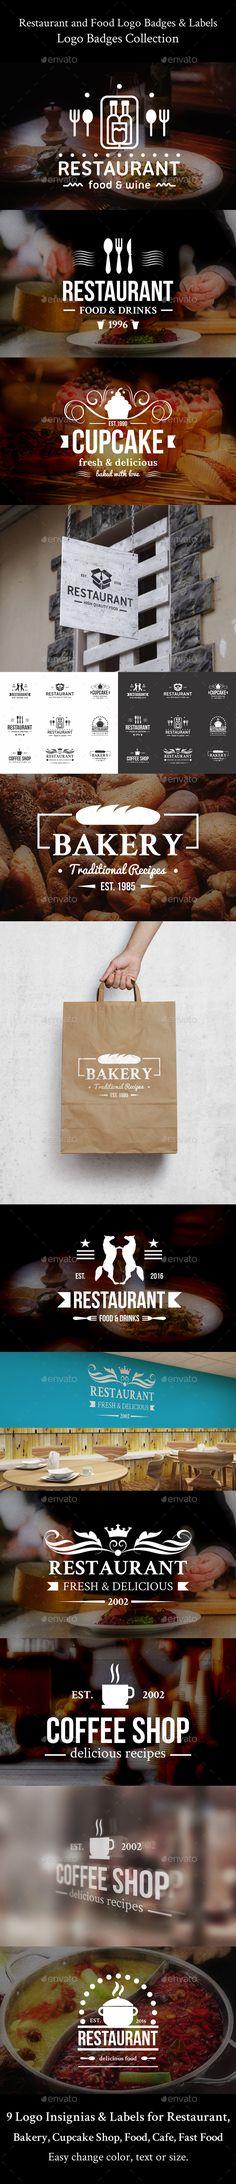 Restaurant and Food Logo Badges & Labels Design Template - Badges & Stickers Design Template Vector EPS, AI Illustrator. Download here: https://graphicriver.net/item/restaurant-and-food-logo-badges-labels/17404422?ref=yinkira